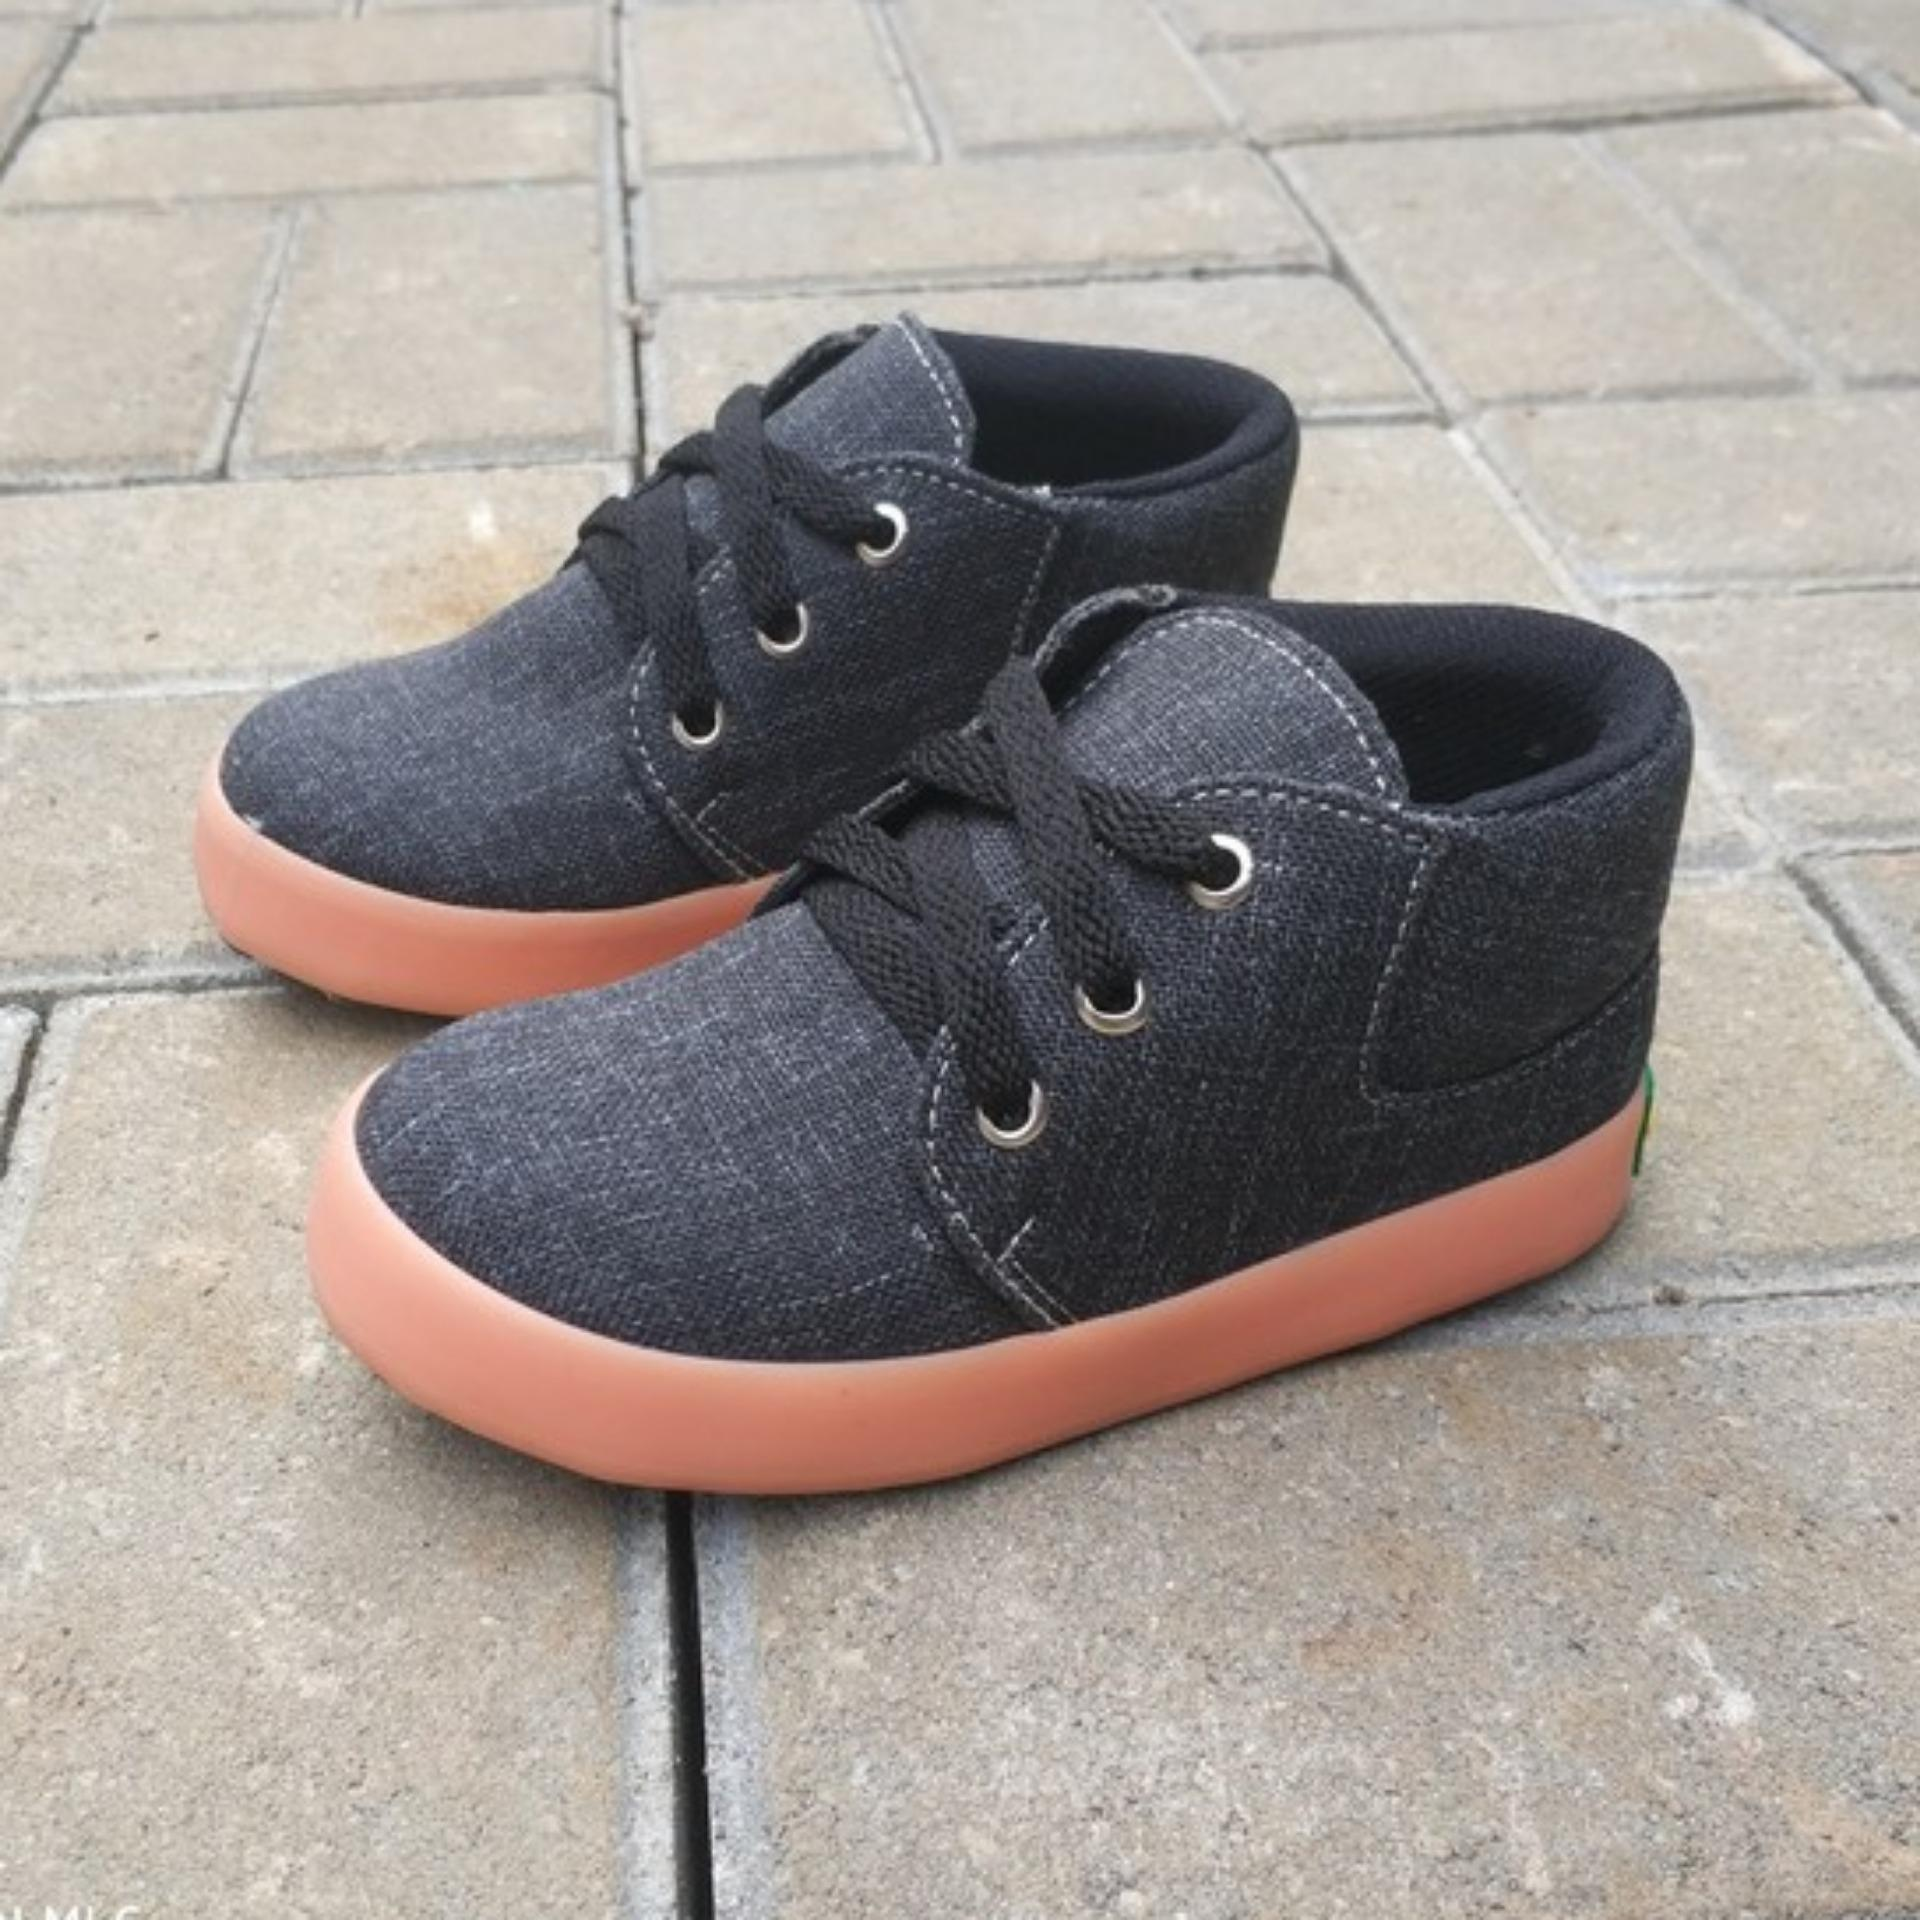 Diskon Shuku Sepatu Sneaker Anak Laki Cowok Semi Boot Keren Casual Trendy Kekinian Shuku Di Jawa Barat